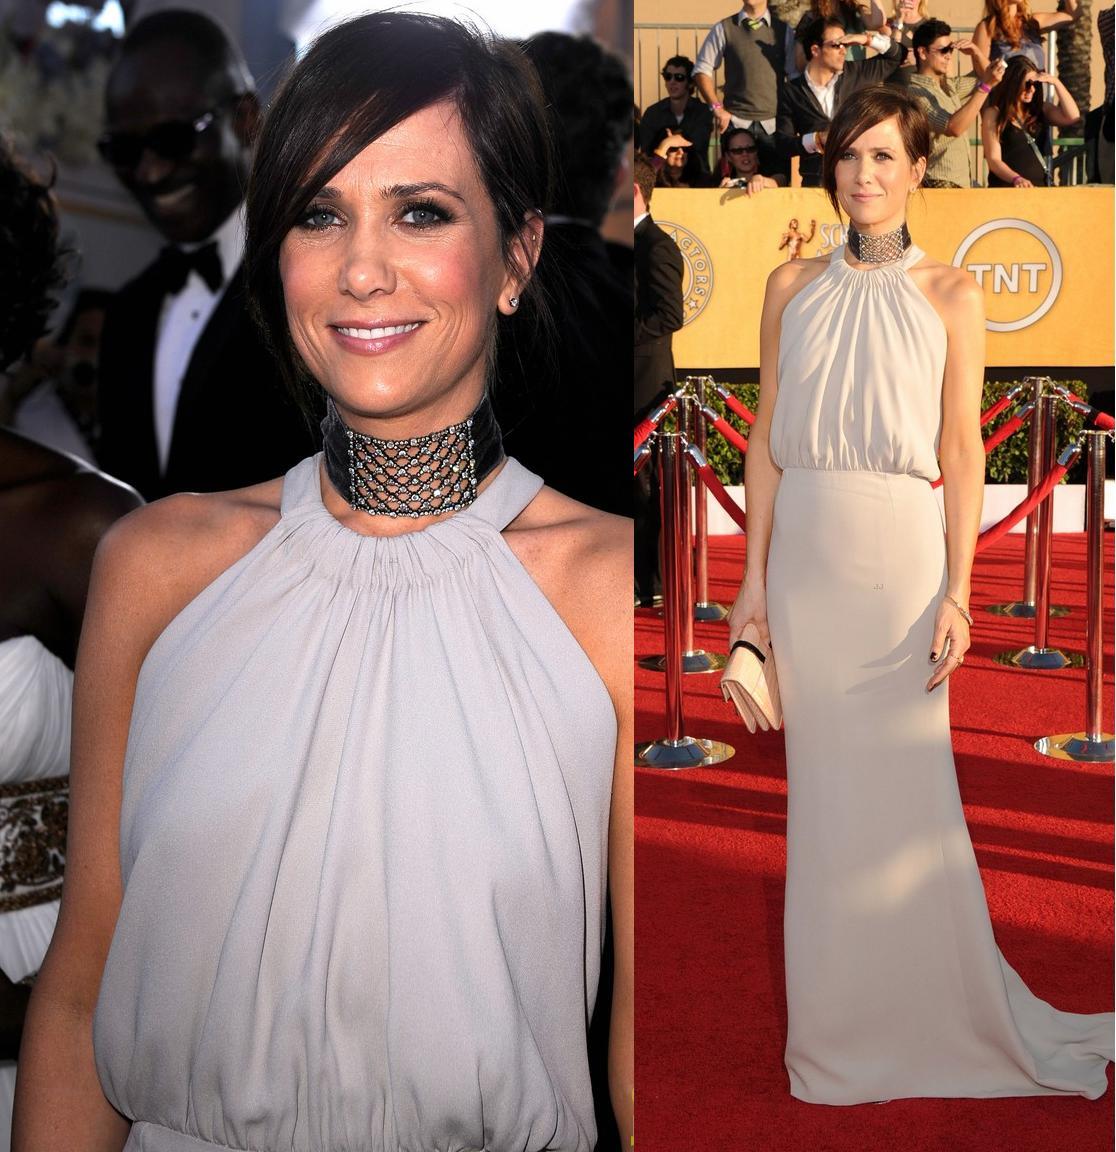 http://3.bp.blogspot.com/-Obc5HRv8yUY/Tya8dKPr1lI/AAAAAAAAEoI/e-j3TywgHJw/s1600/Kristen+Wiig+In+Balenciaga+-+2012+Screen+Actors+Guild+Awards.jpg